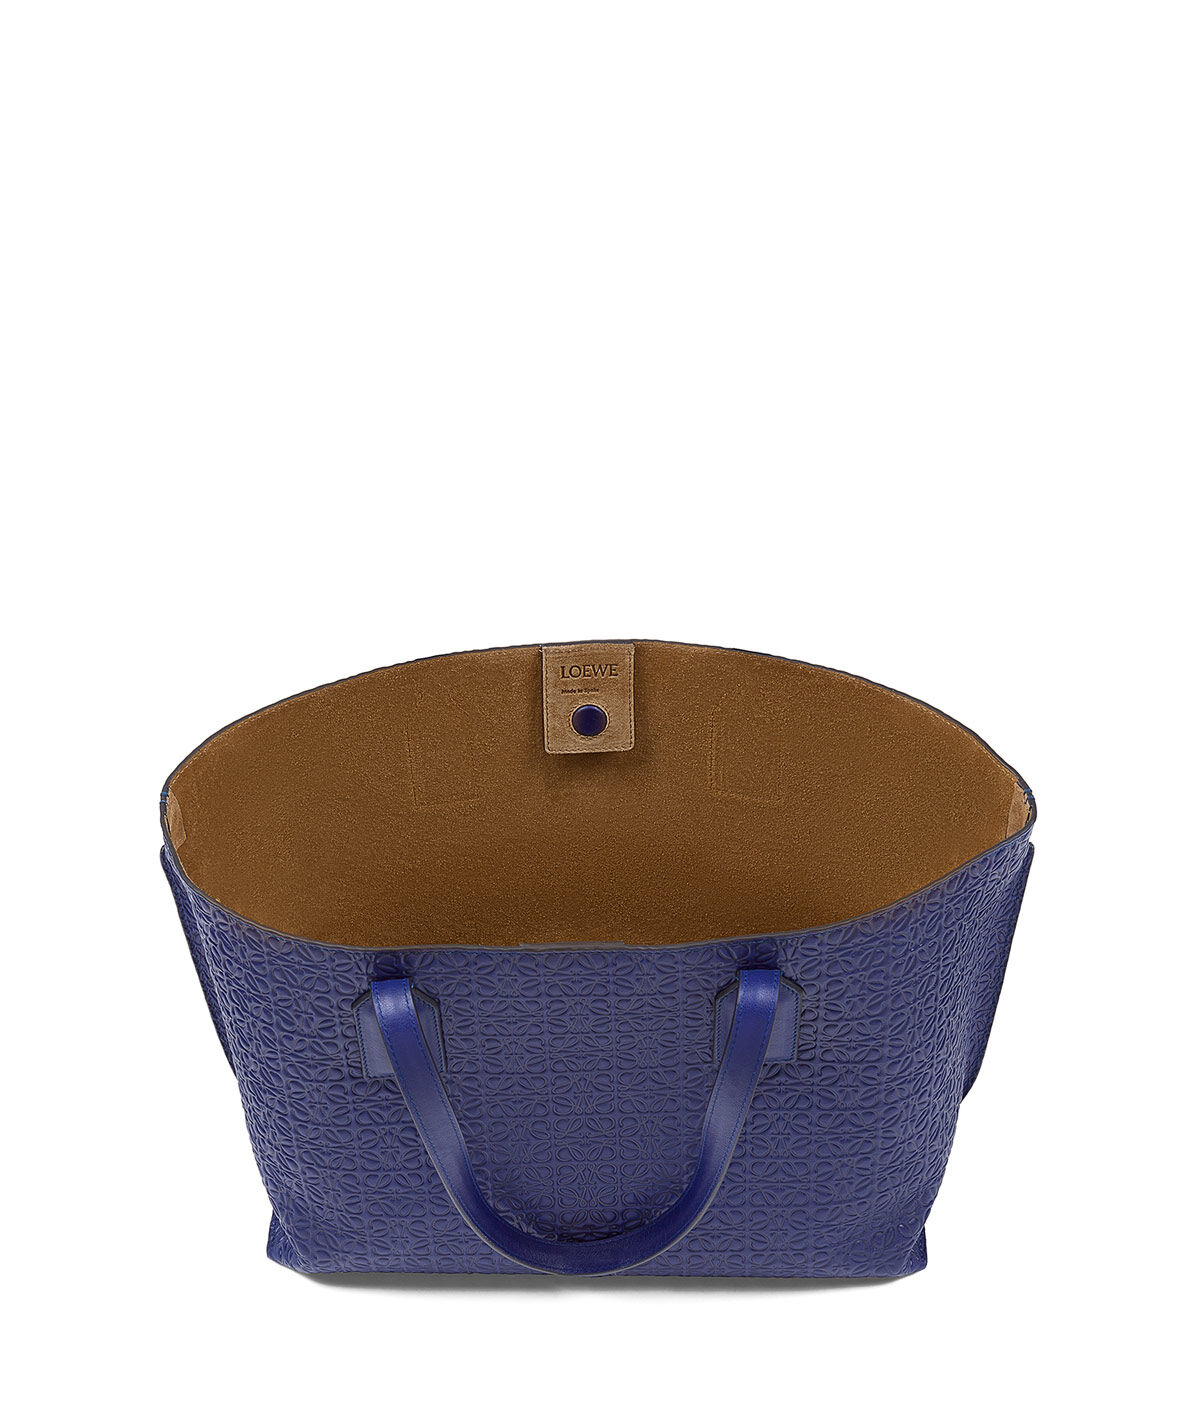 LOEWE T Shopper Bag Navy Blue all